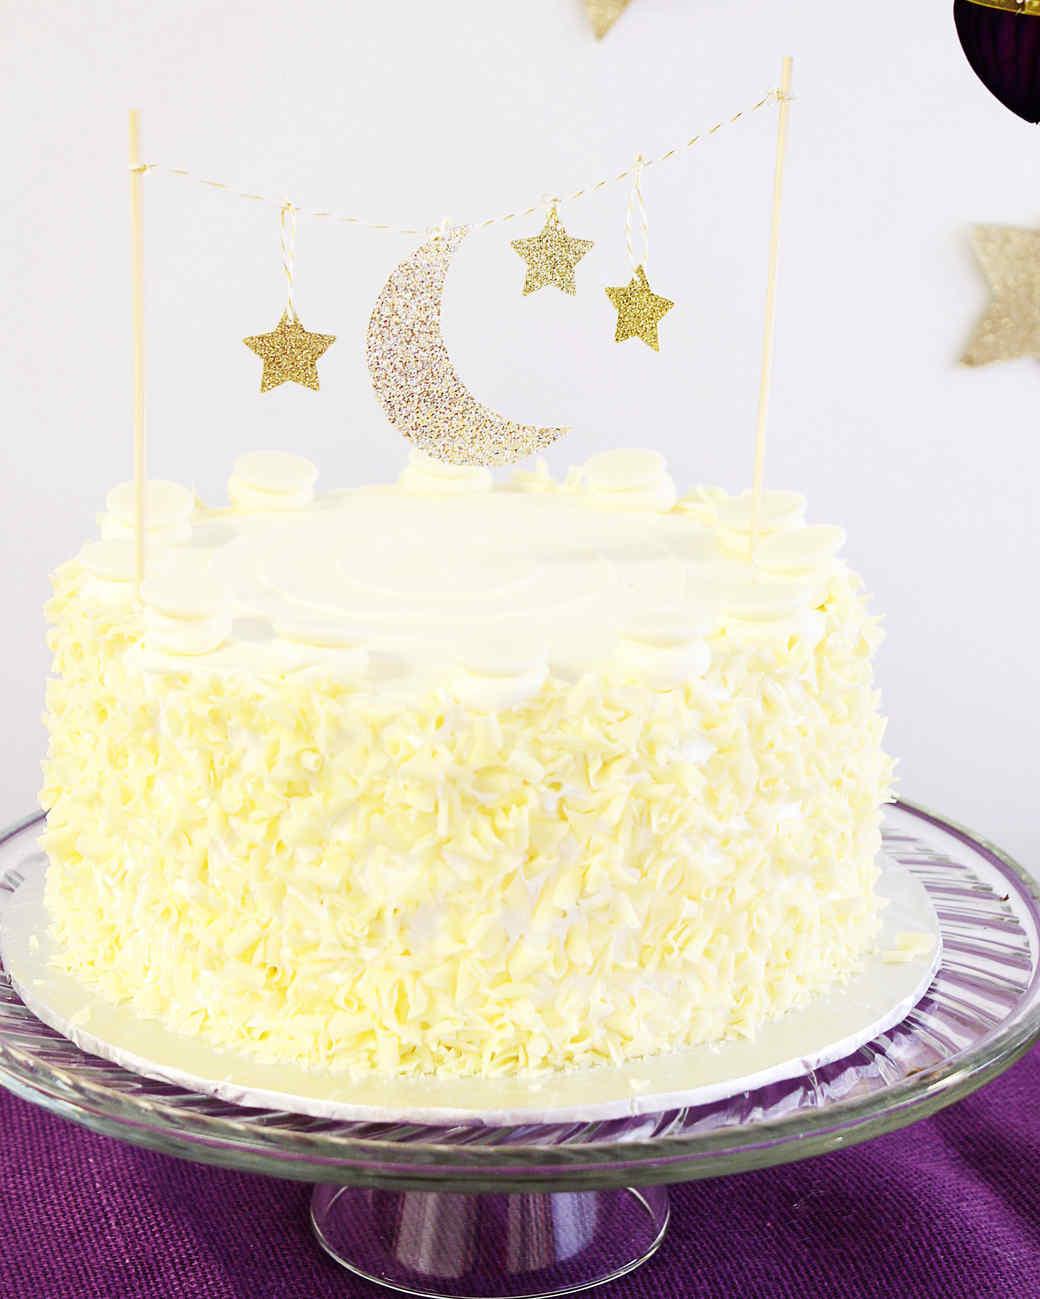 Cool Dinner Eid Al-Fitr Decorations - eid-al-fitr-cake-topper-1-0617_vert  Photograph_38533 .jpg?itok\u003dlE3og2sW